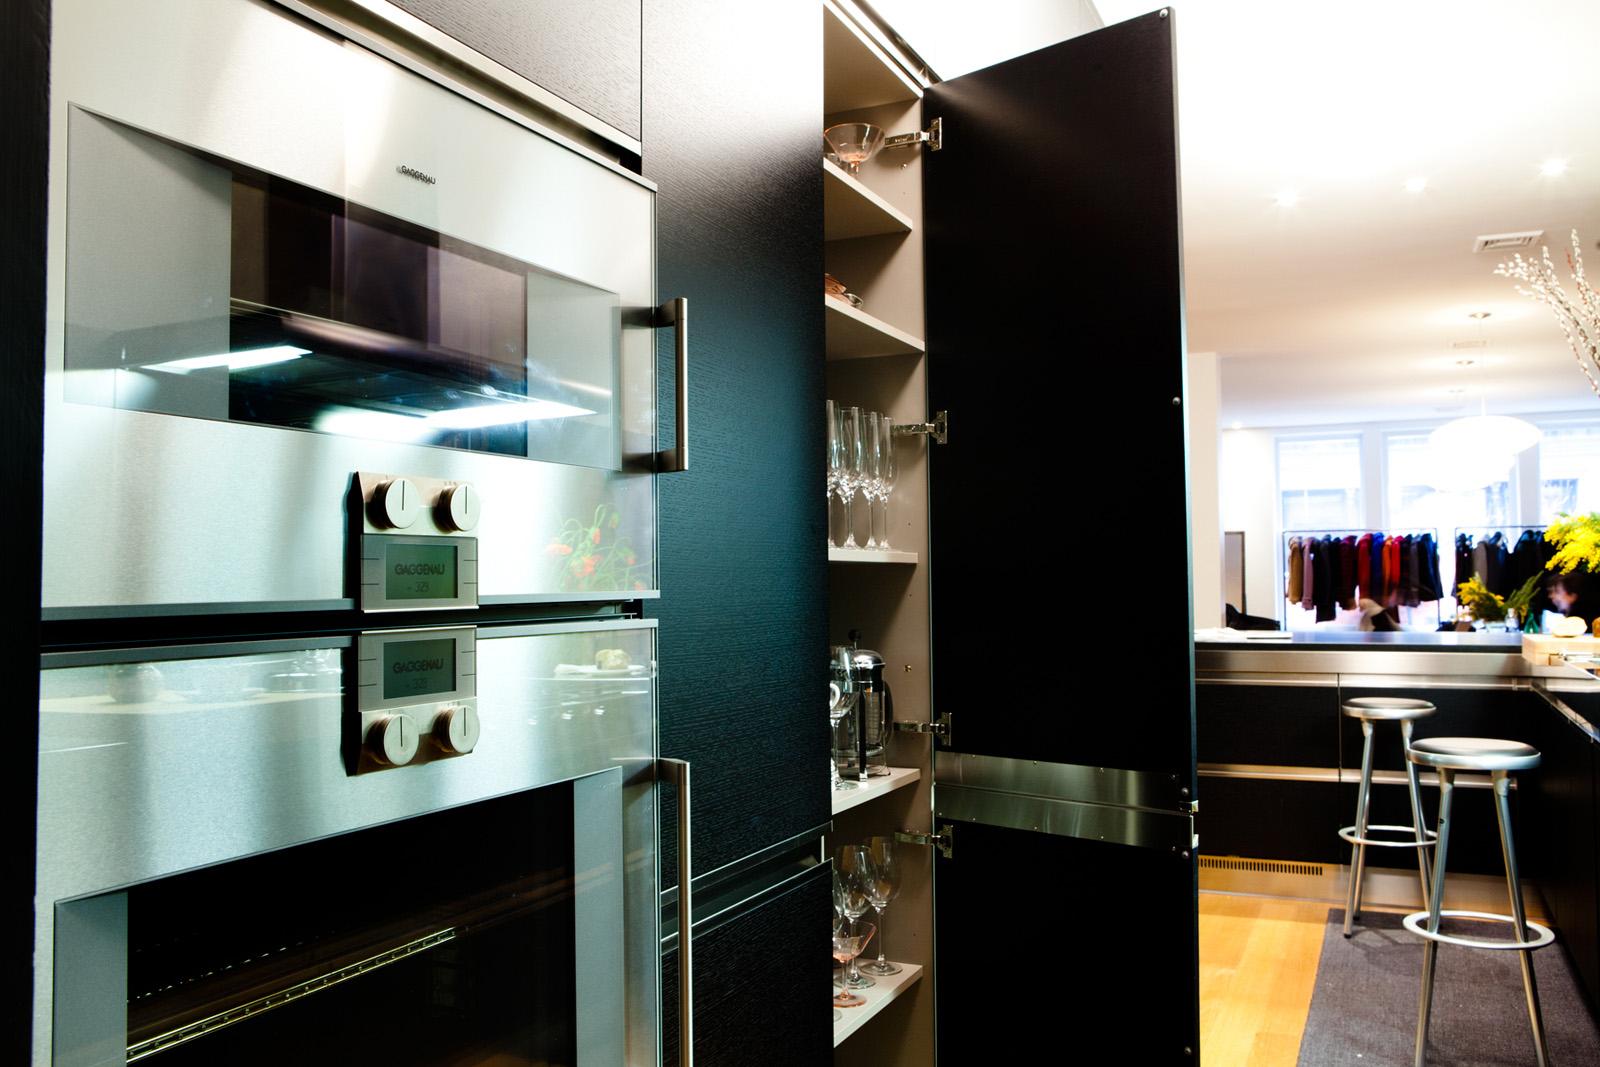 dramov kitchen ovens